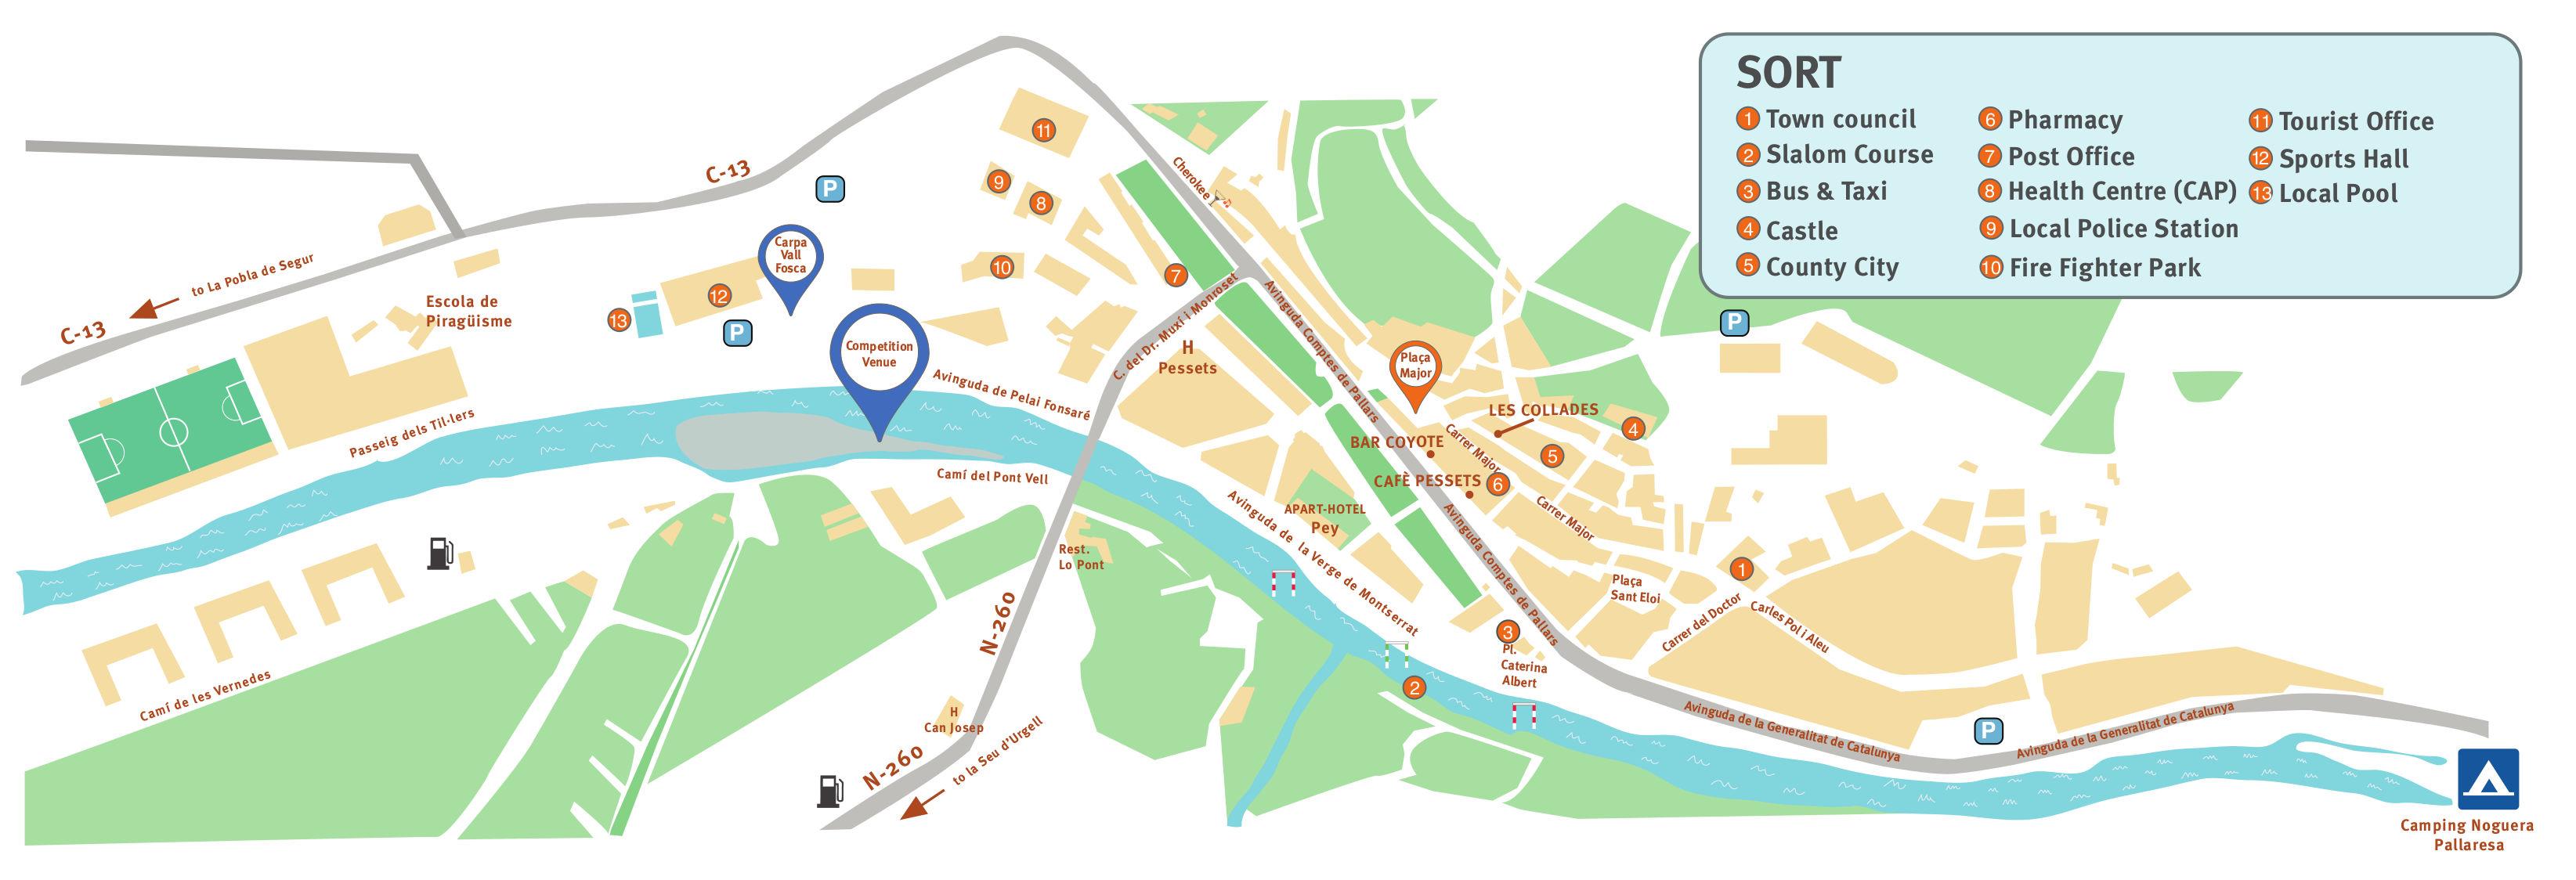 Sort map